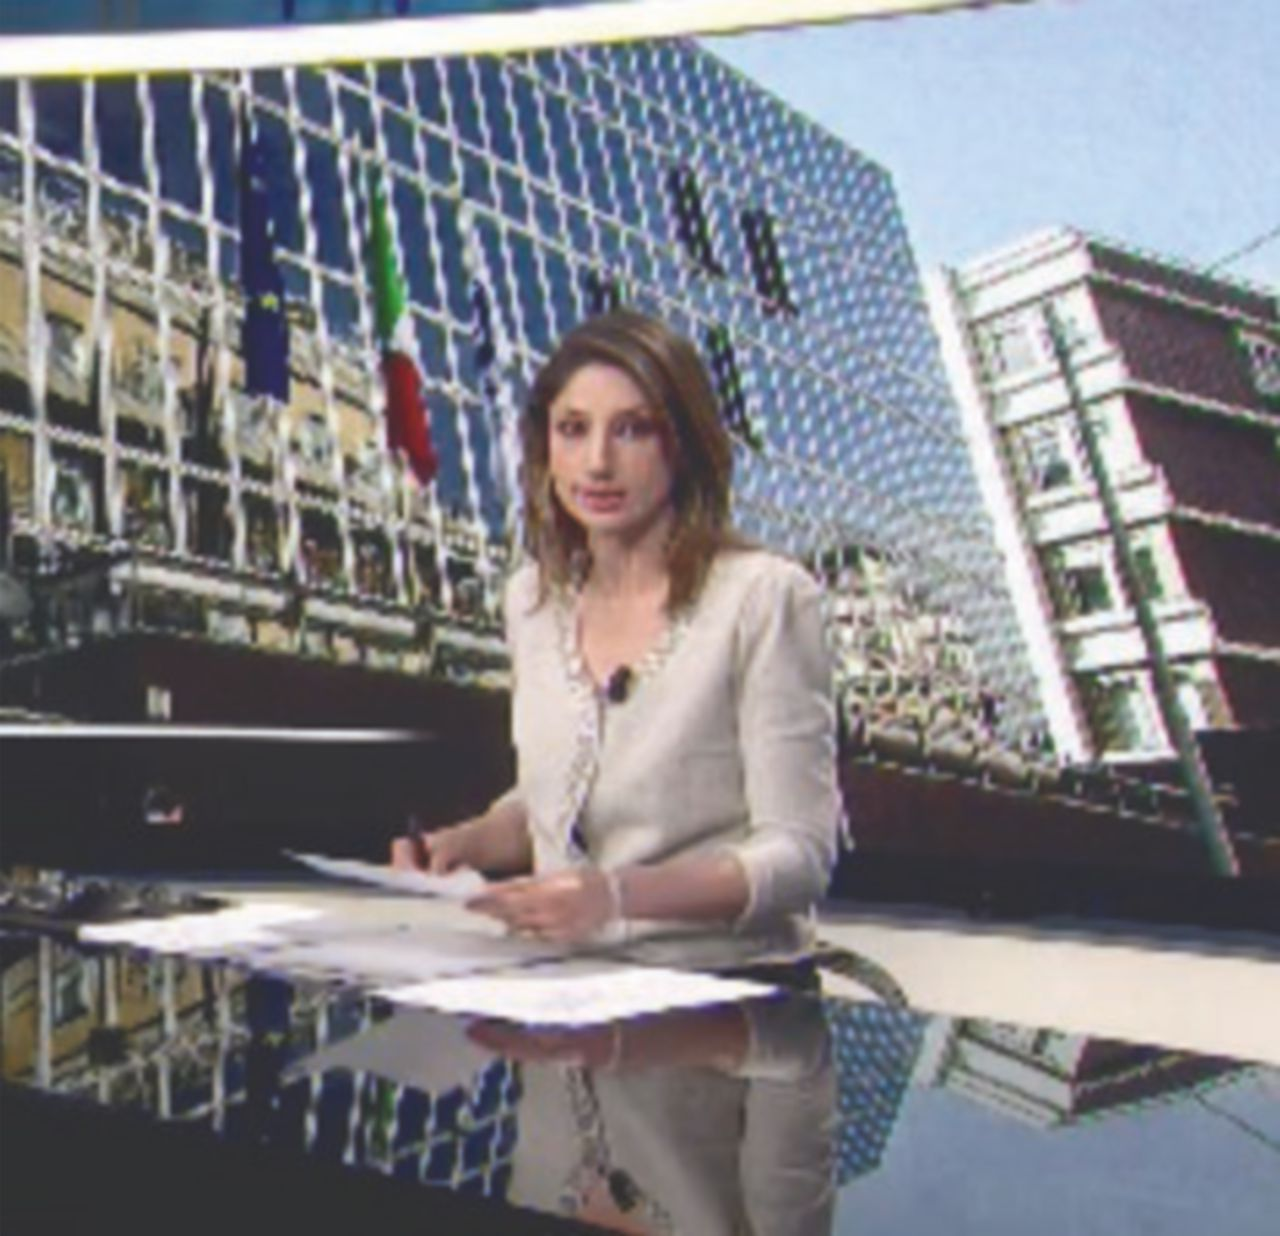 C'è sindaco e sindaco: Roma apre i tg, Milano no